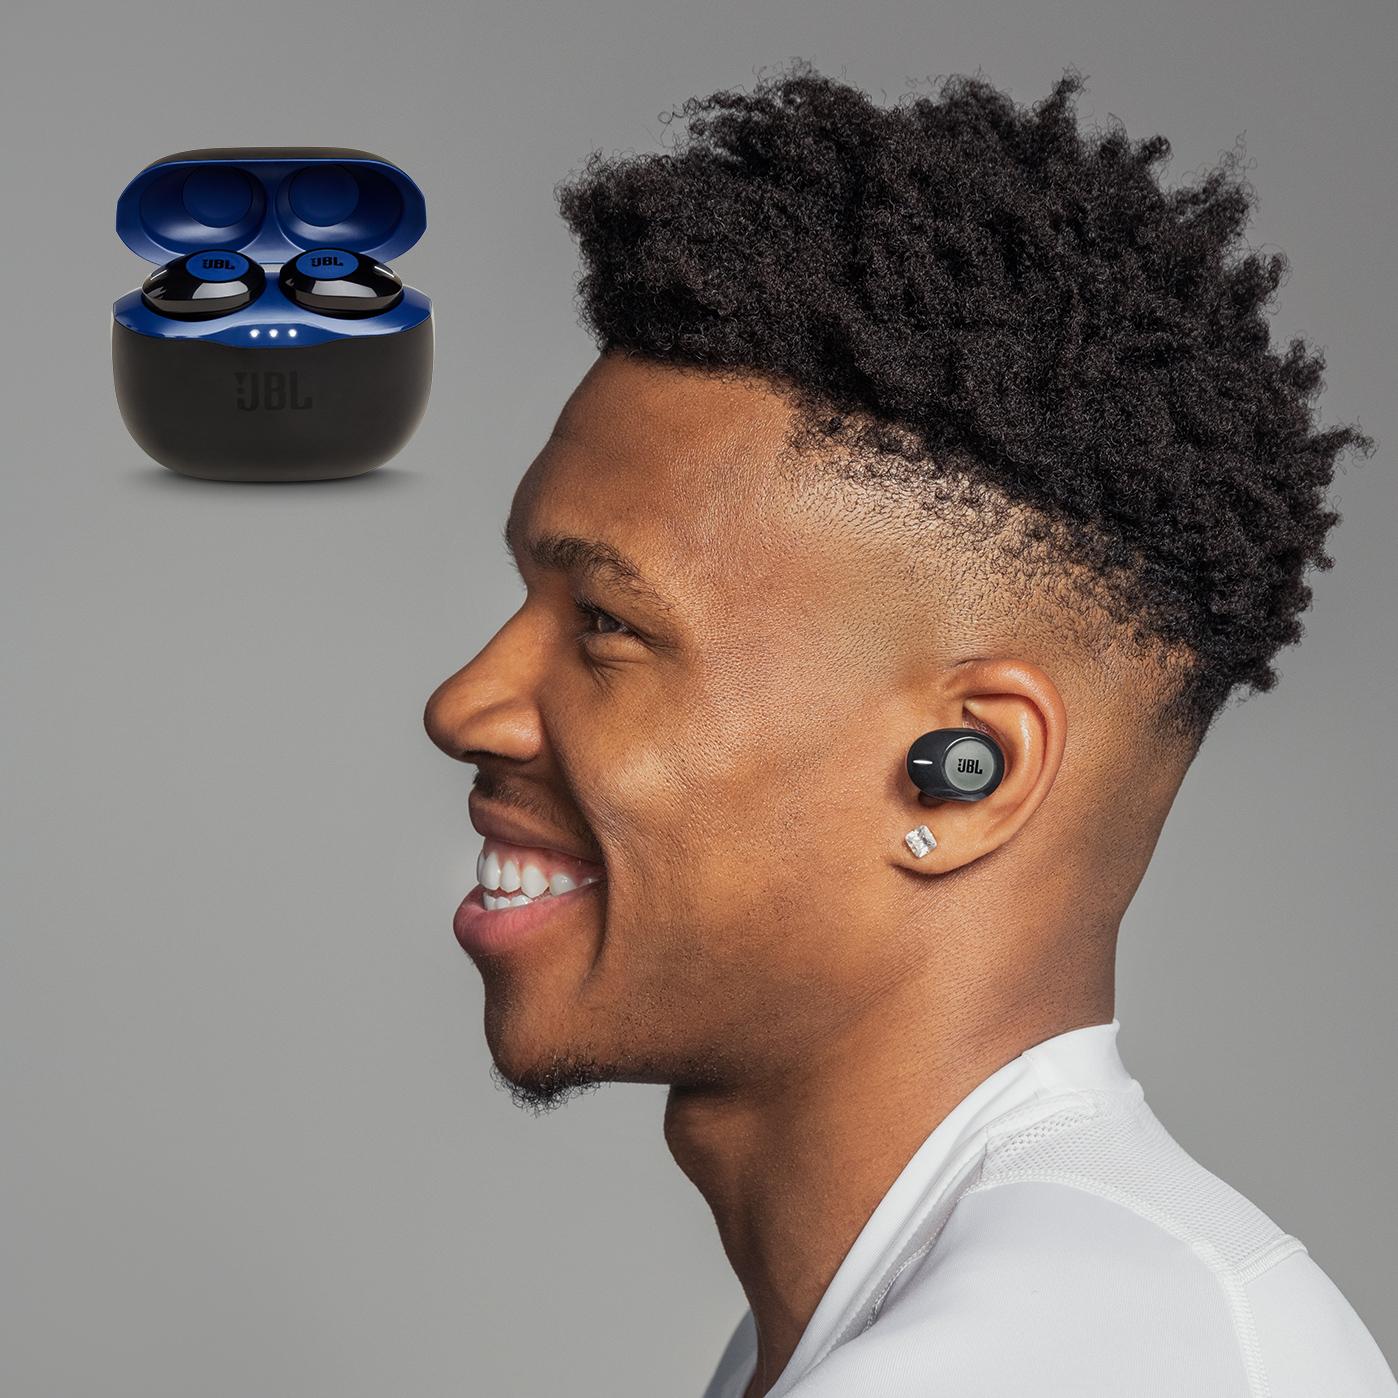 thumbnail JBL Wireless Earbuds